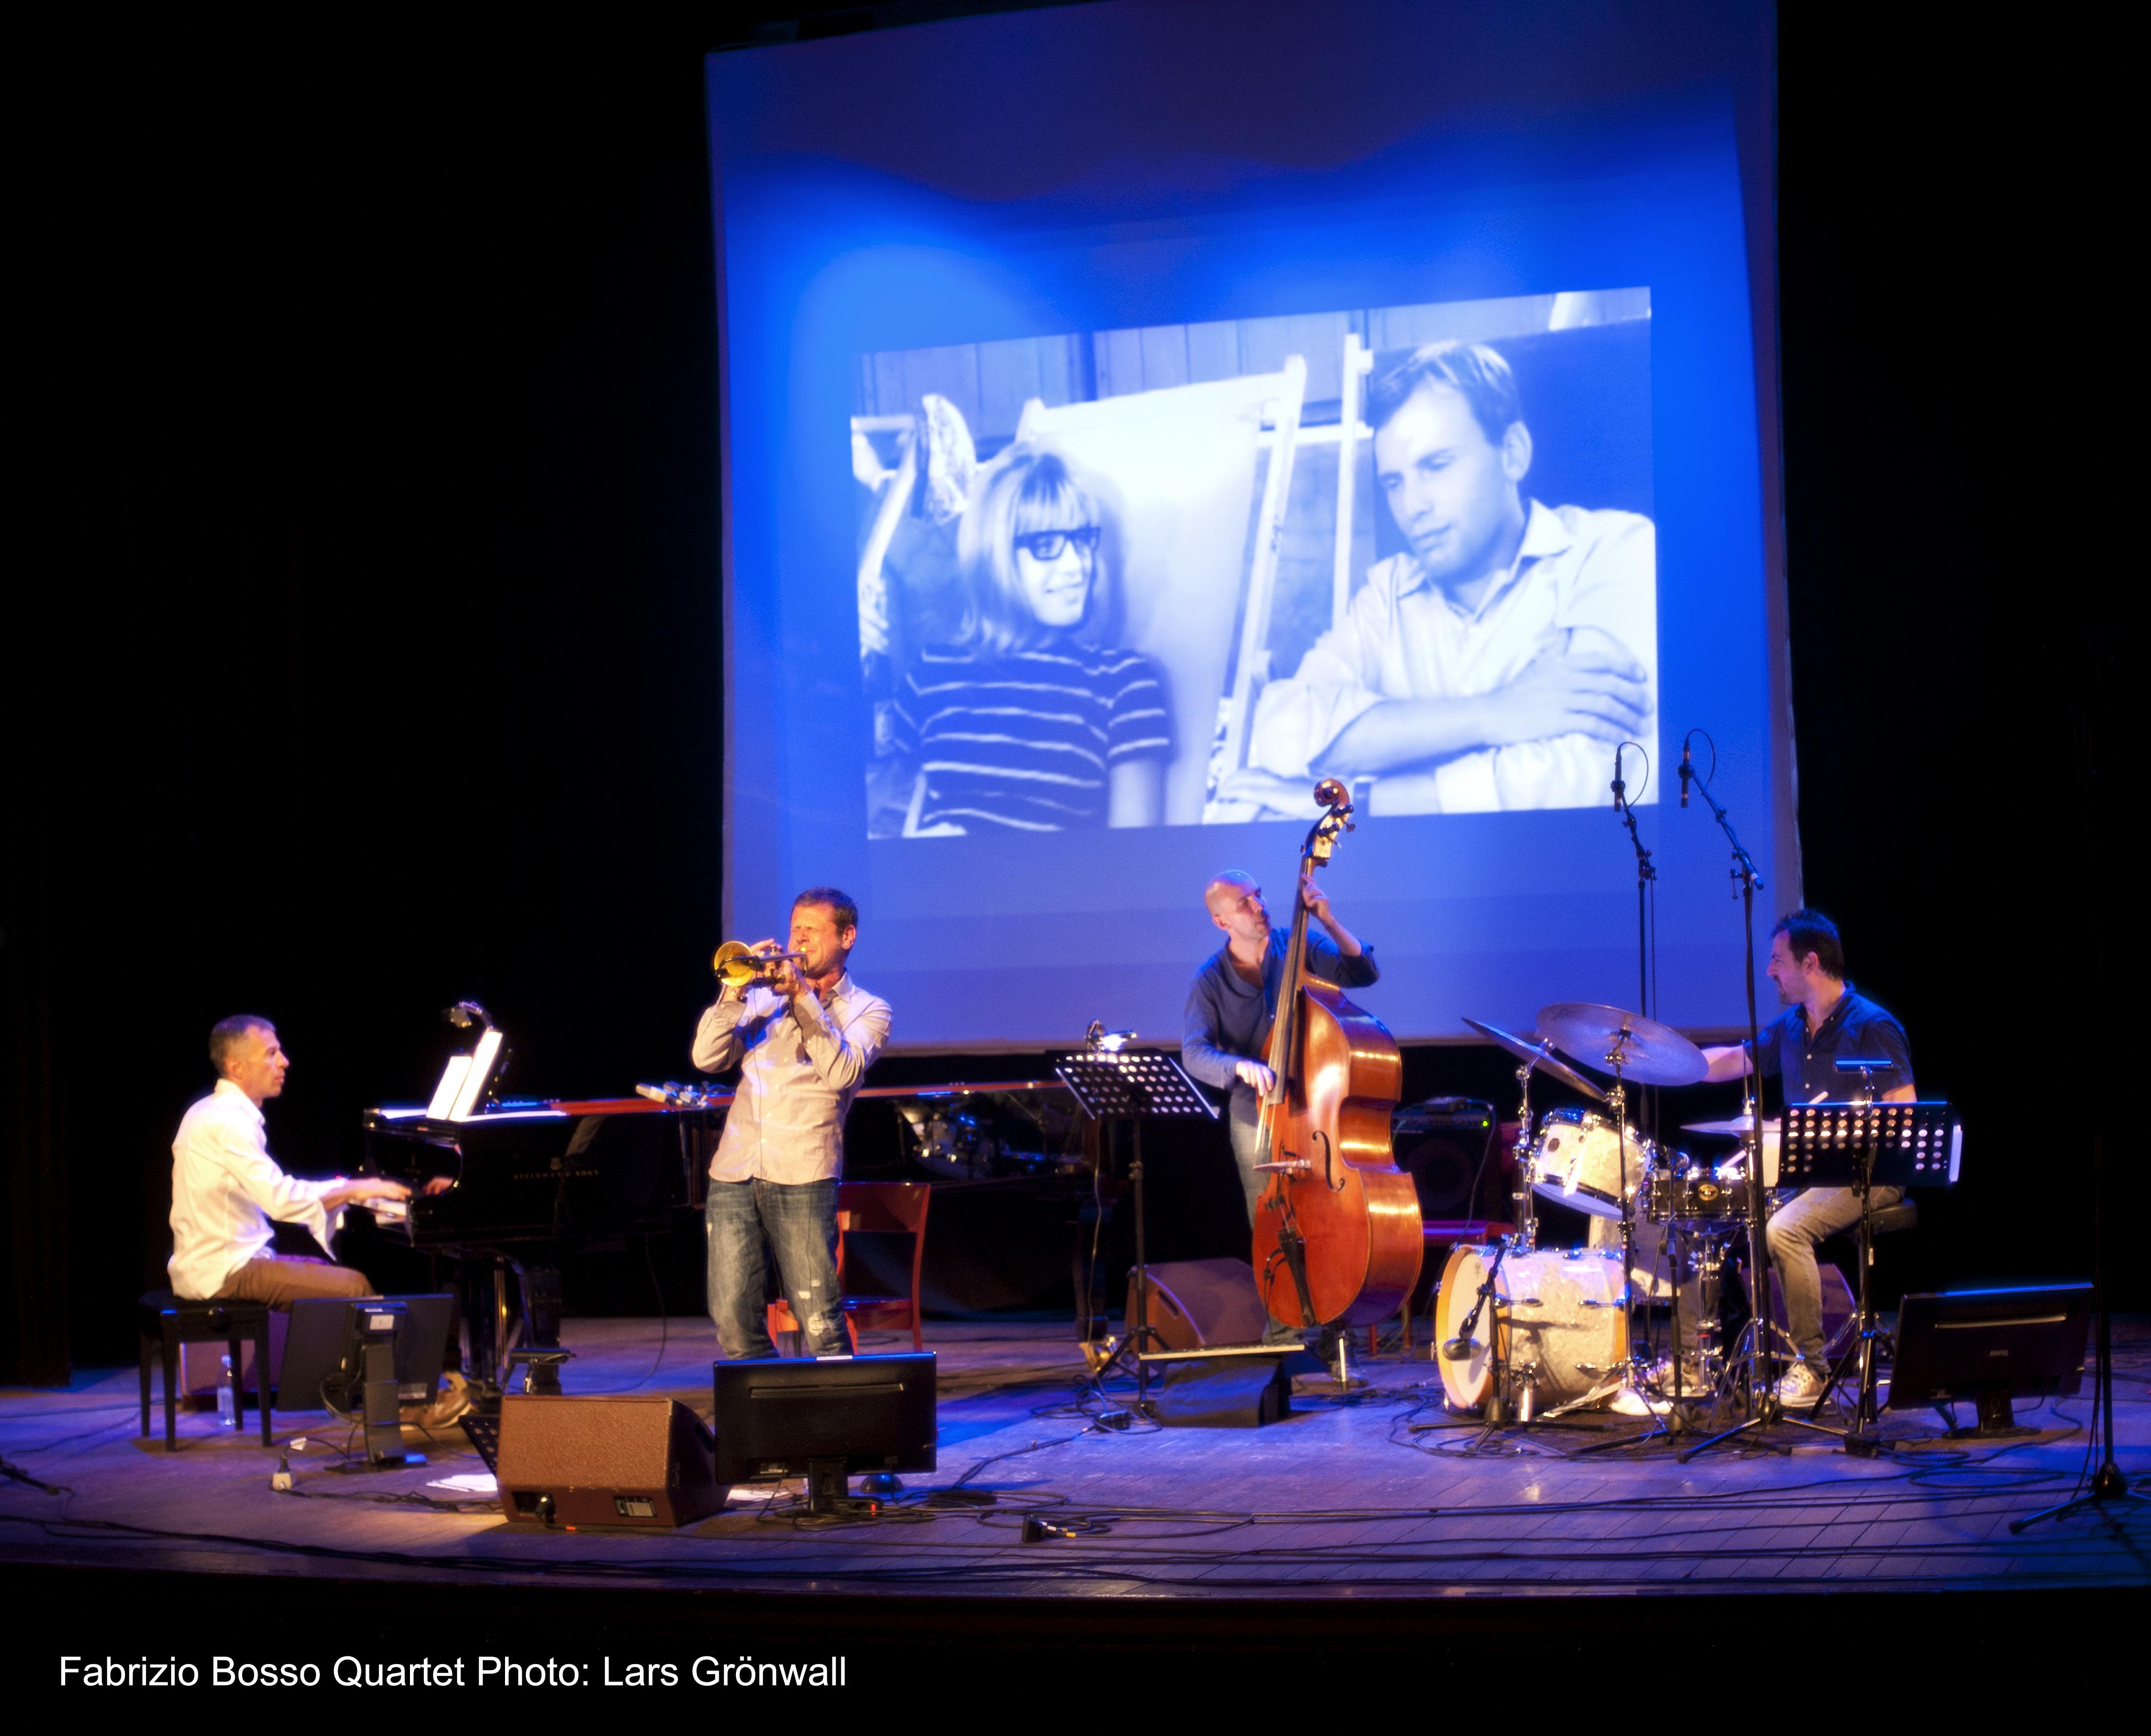 Fabrizio Bosso Quartet 2